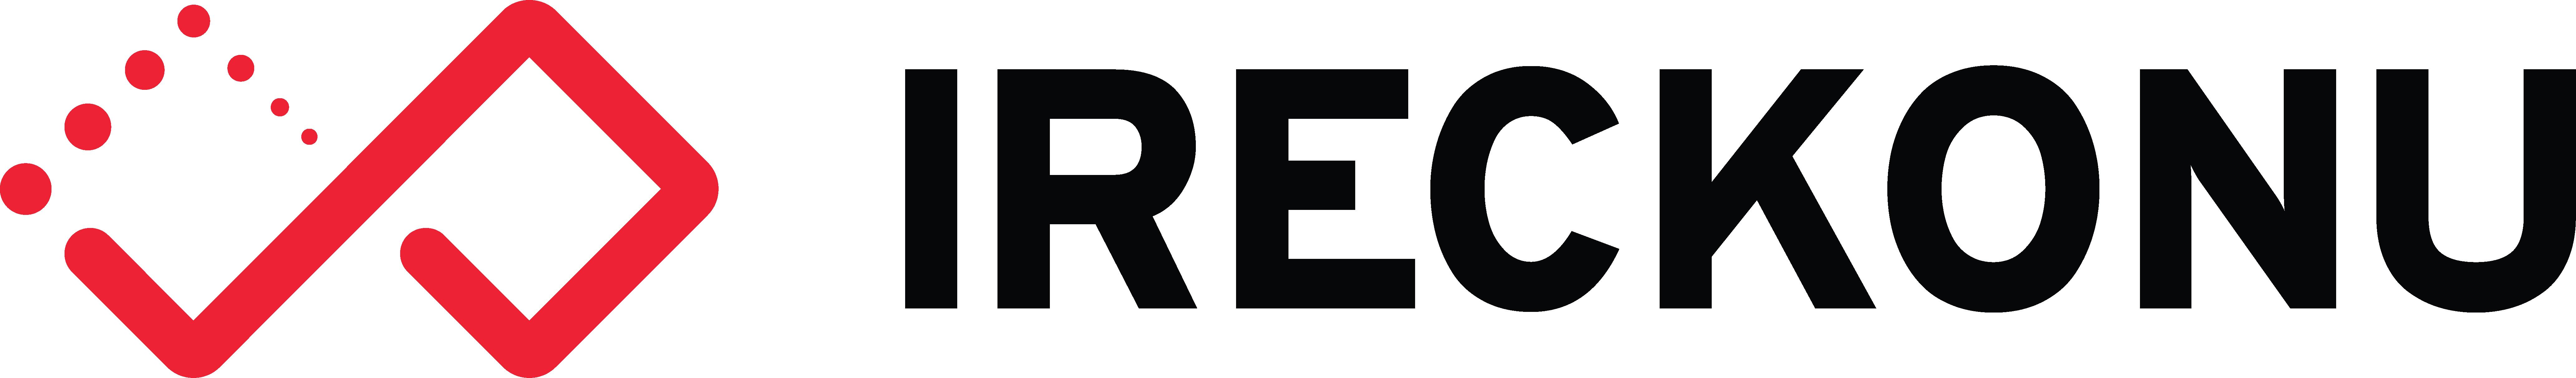 ireckonu-logo